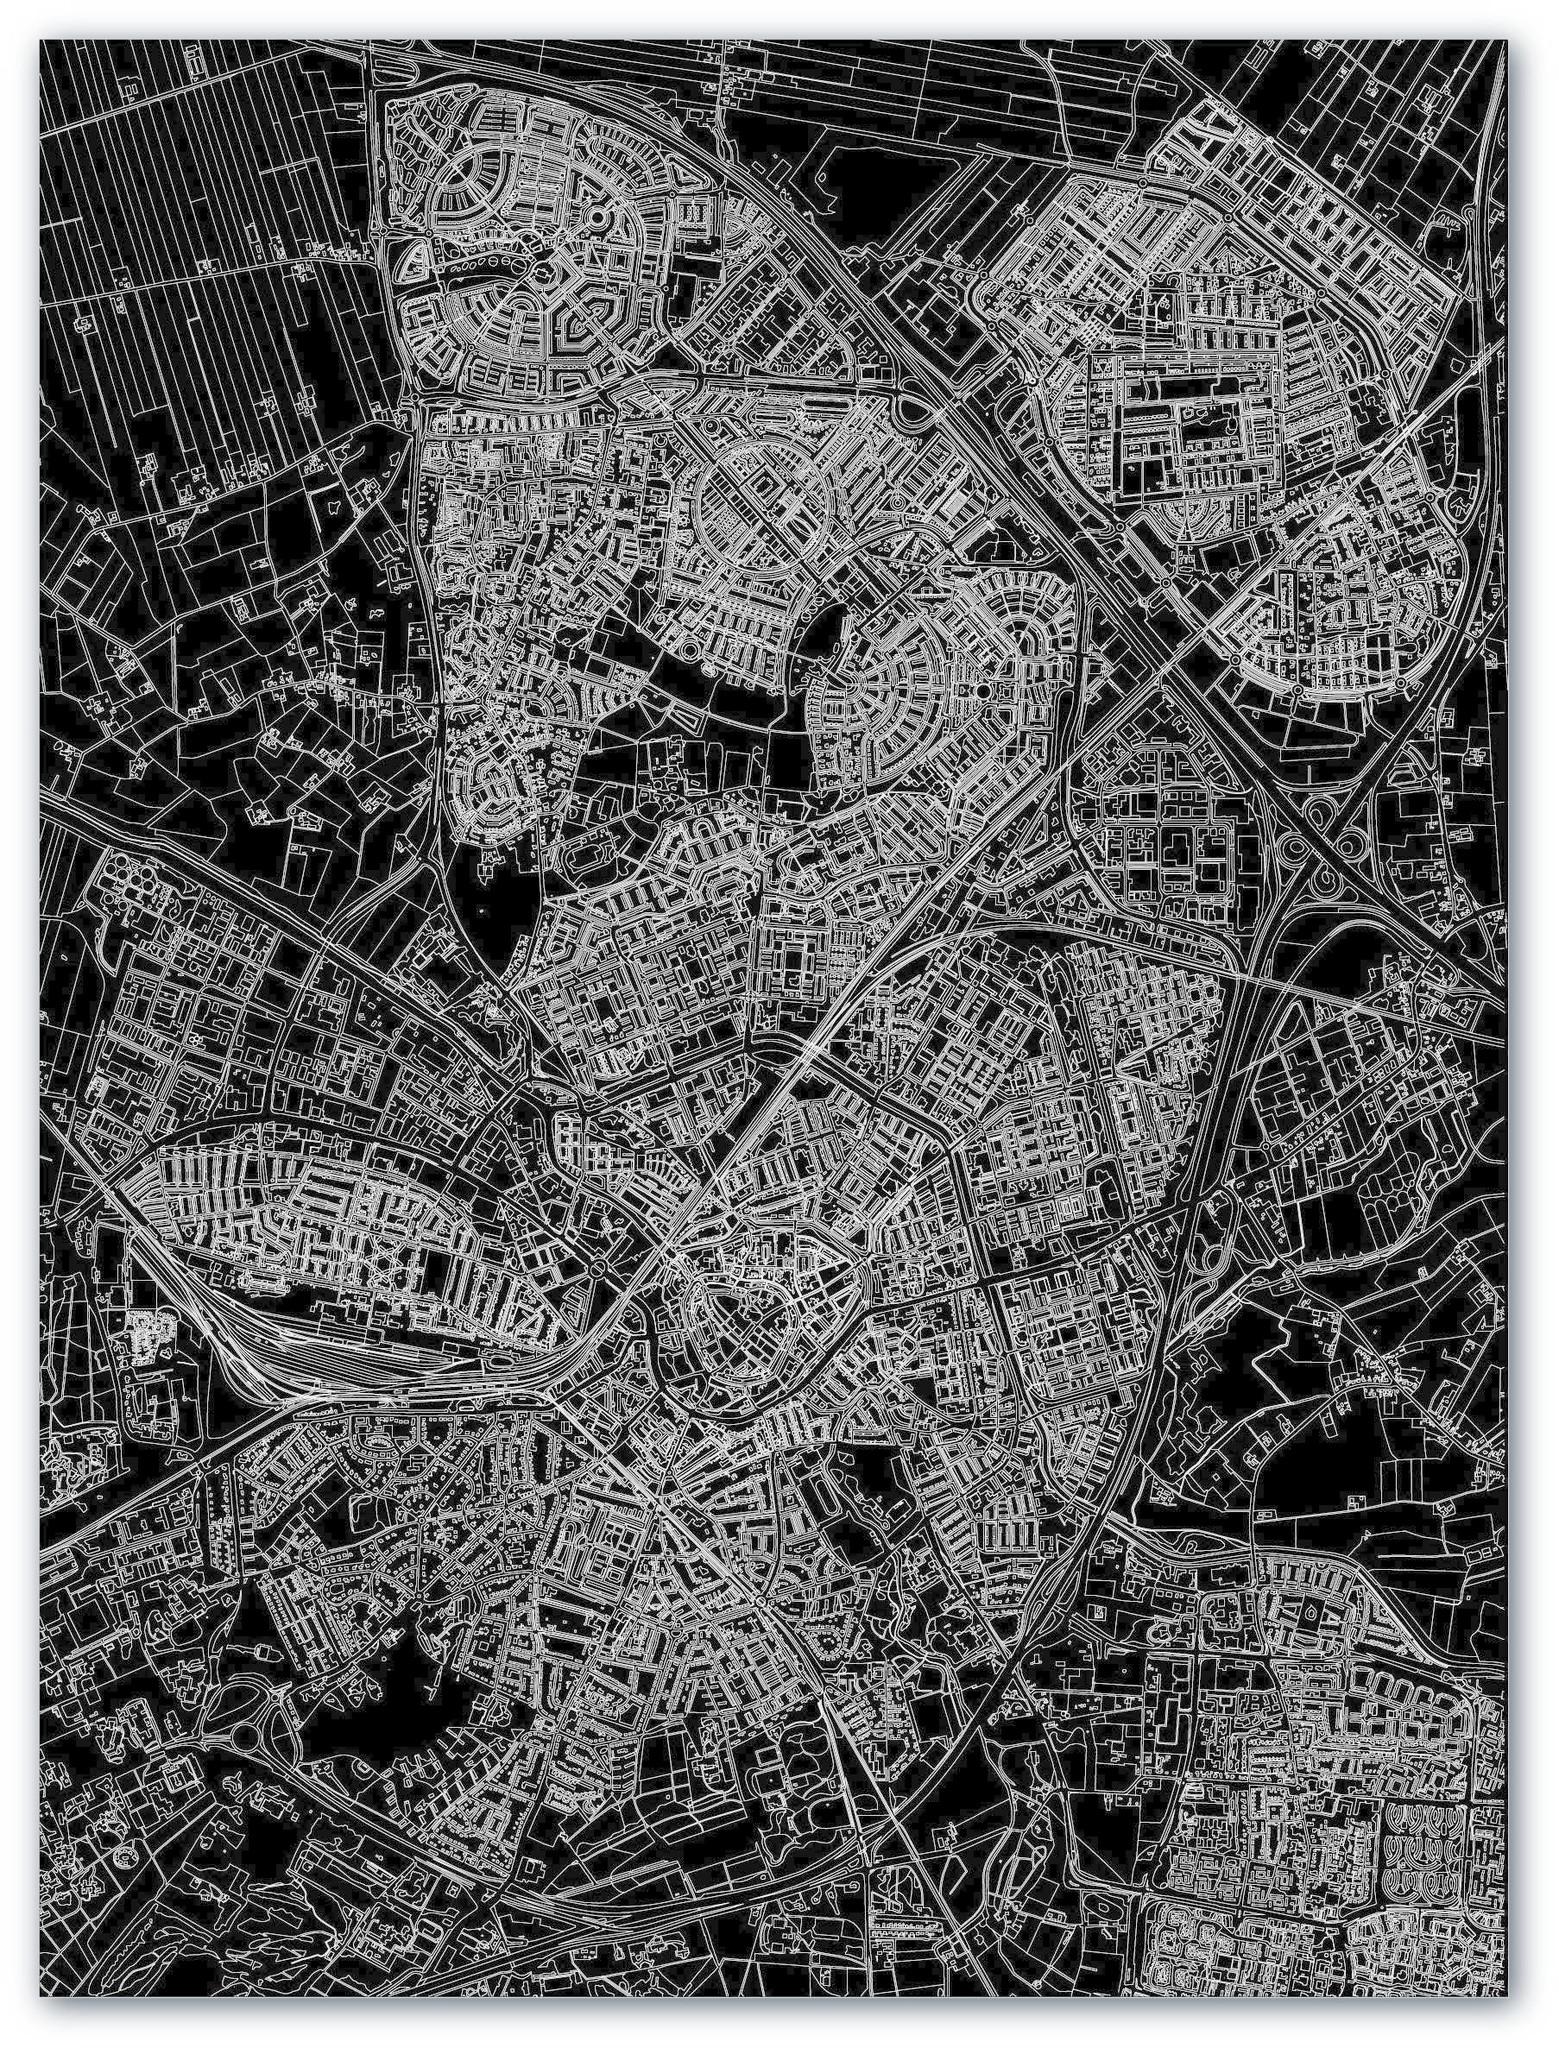 Stadtkarte Amersfoort | Aluminium Wanddekoration-3